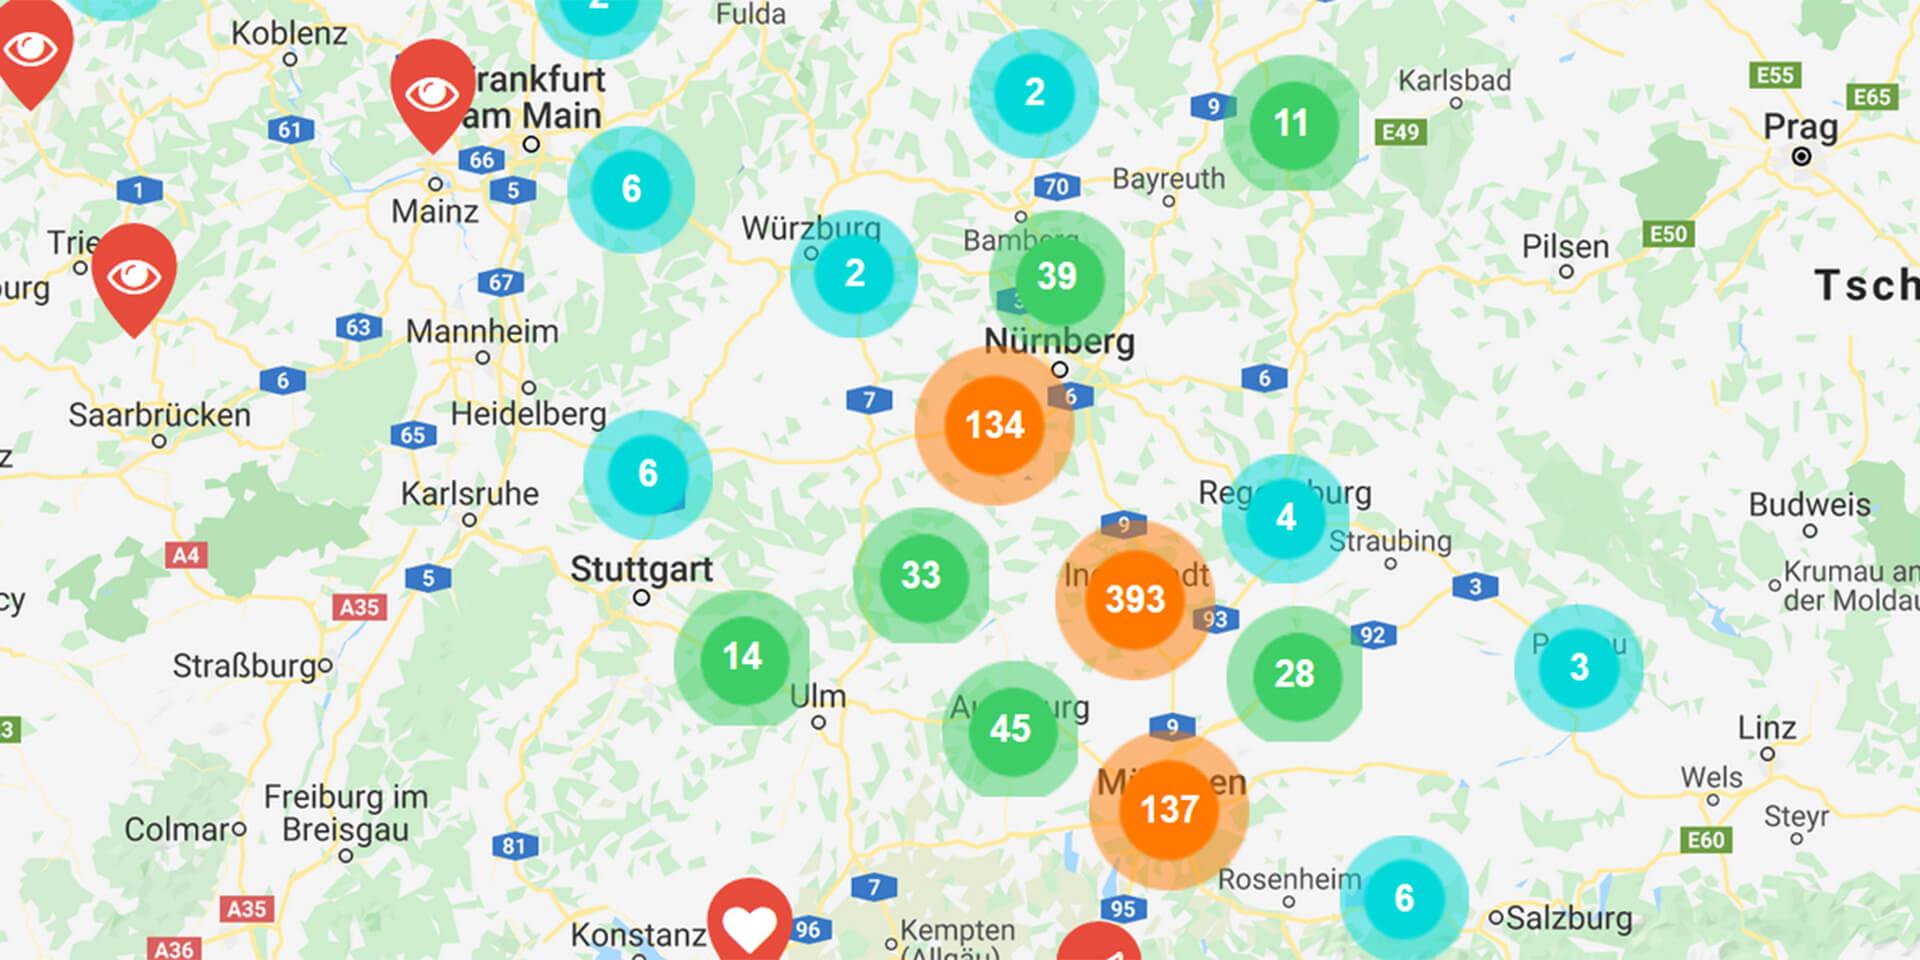 www.evangelisch-digital.de - Karte mit Angeboten,© evangelisch-digital.de